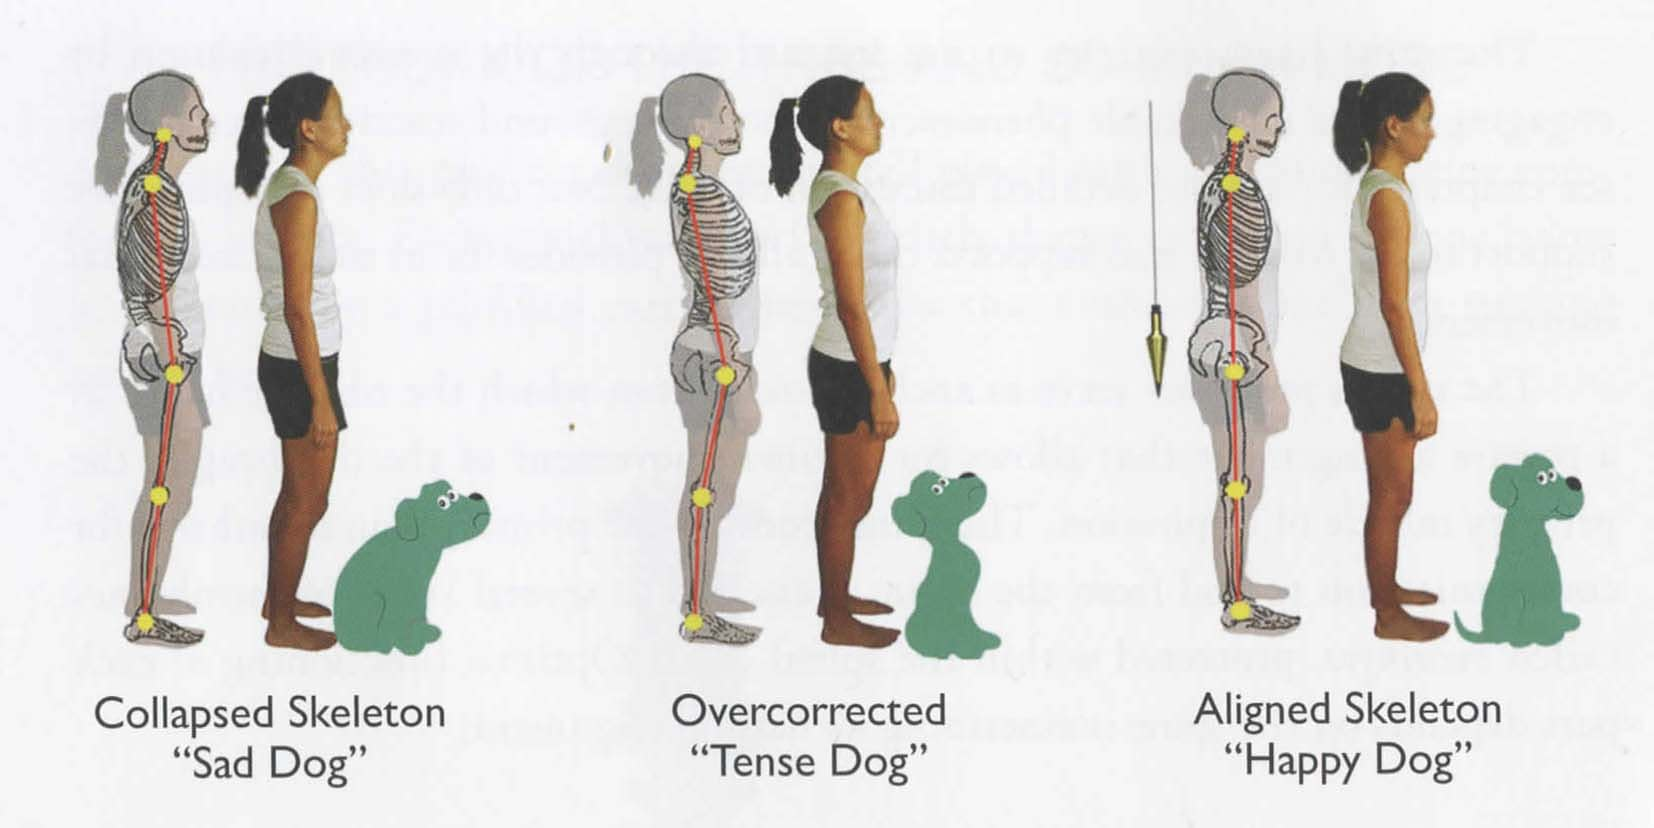 sad-tense-happy-dog-standing